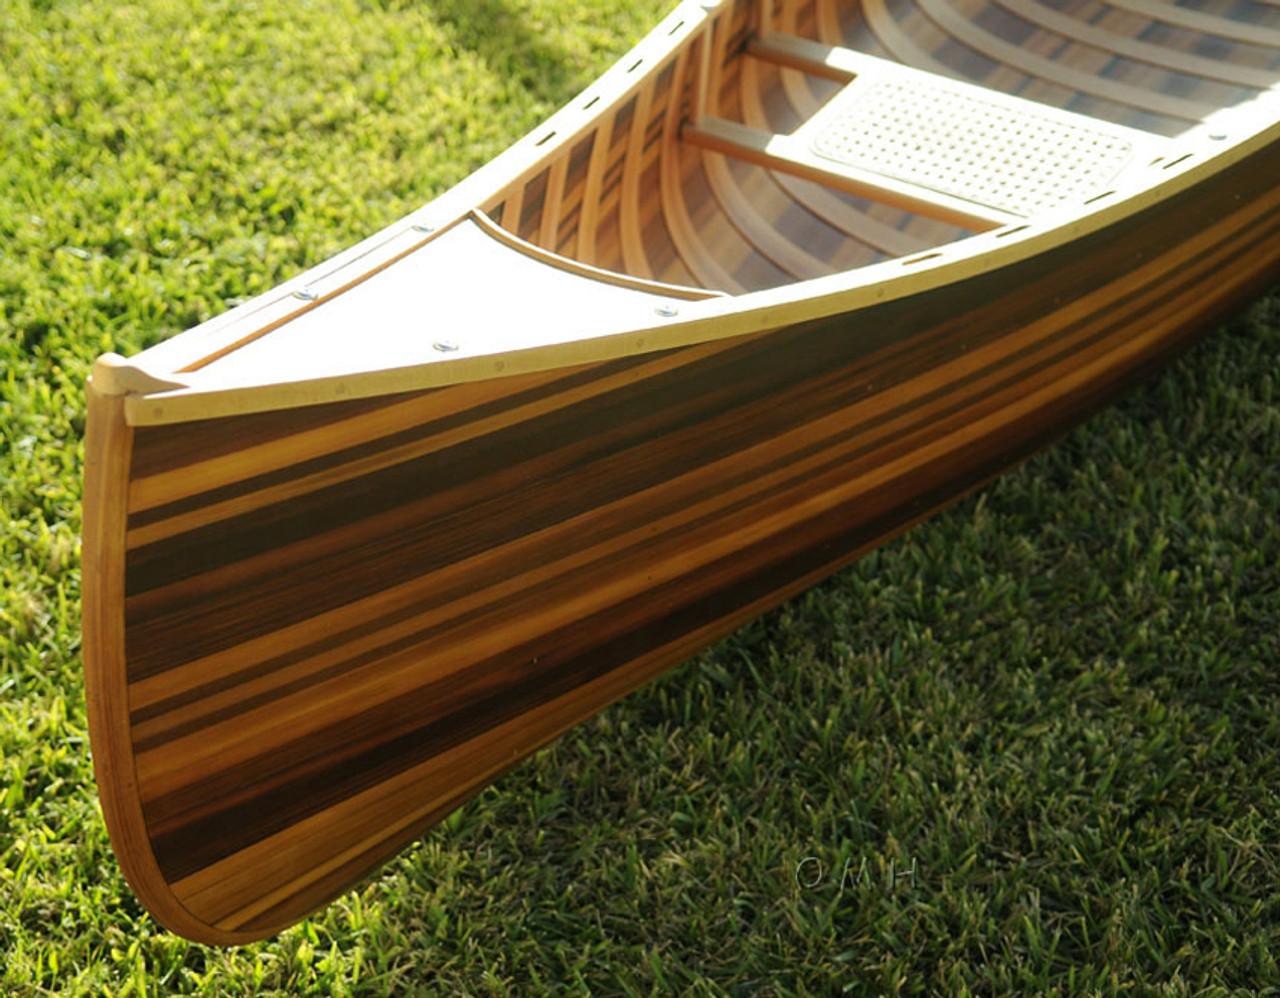 Strip built freighter canoe